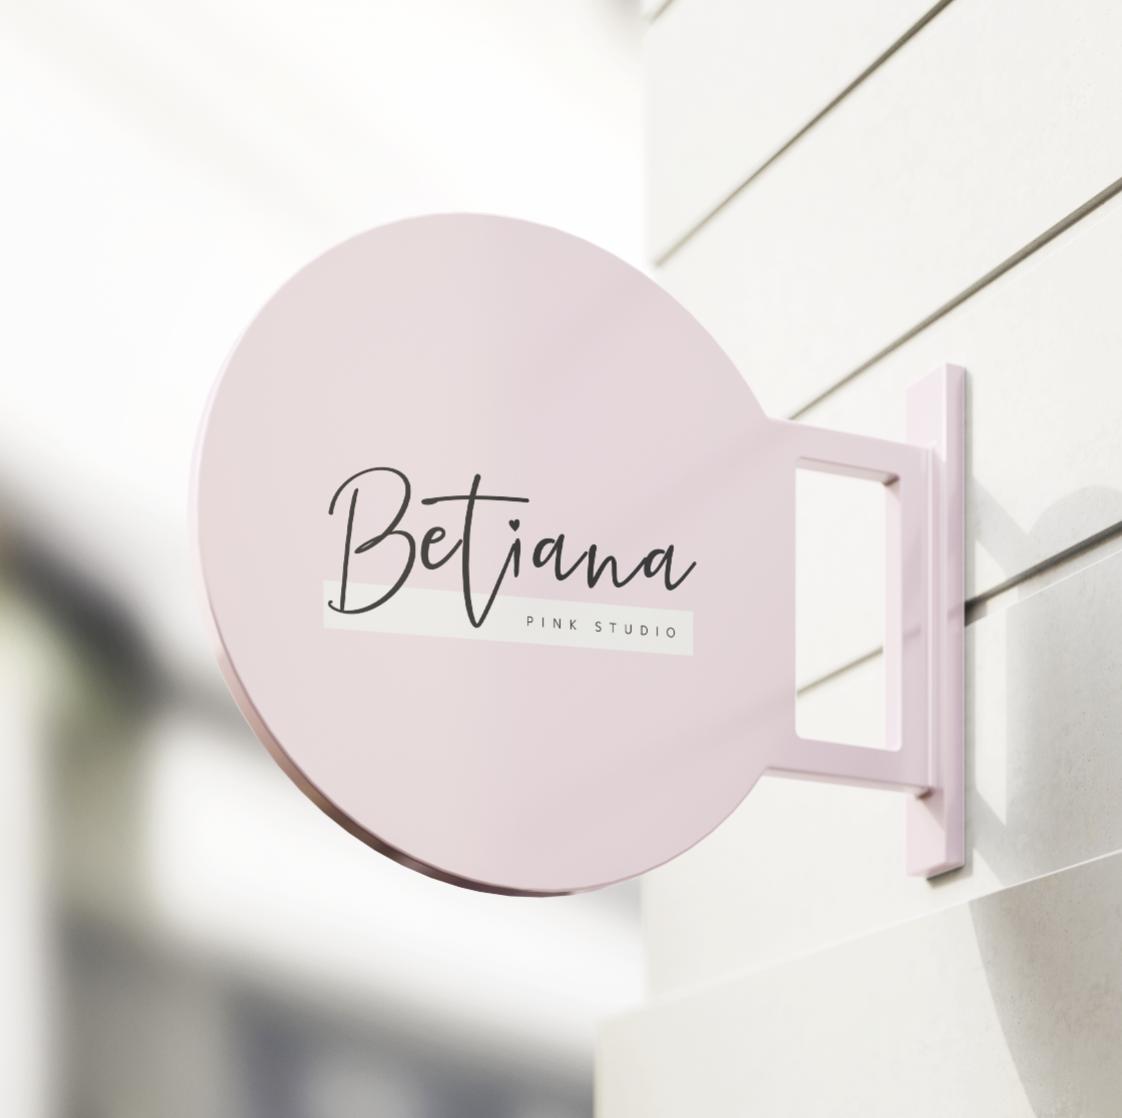 Betiana Pink Studio